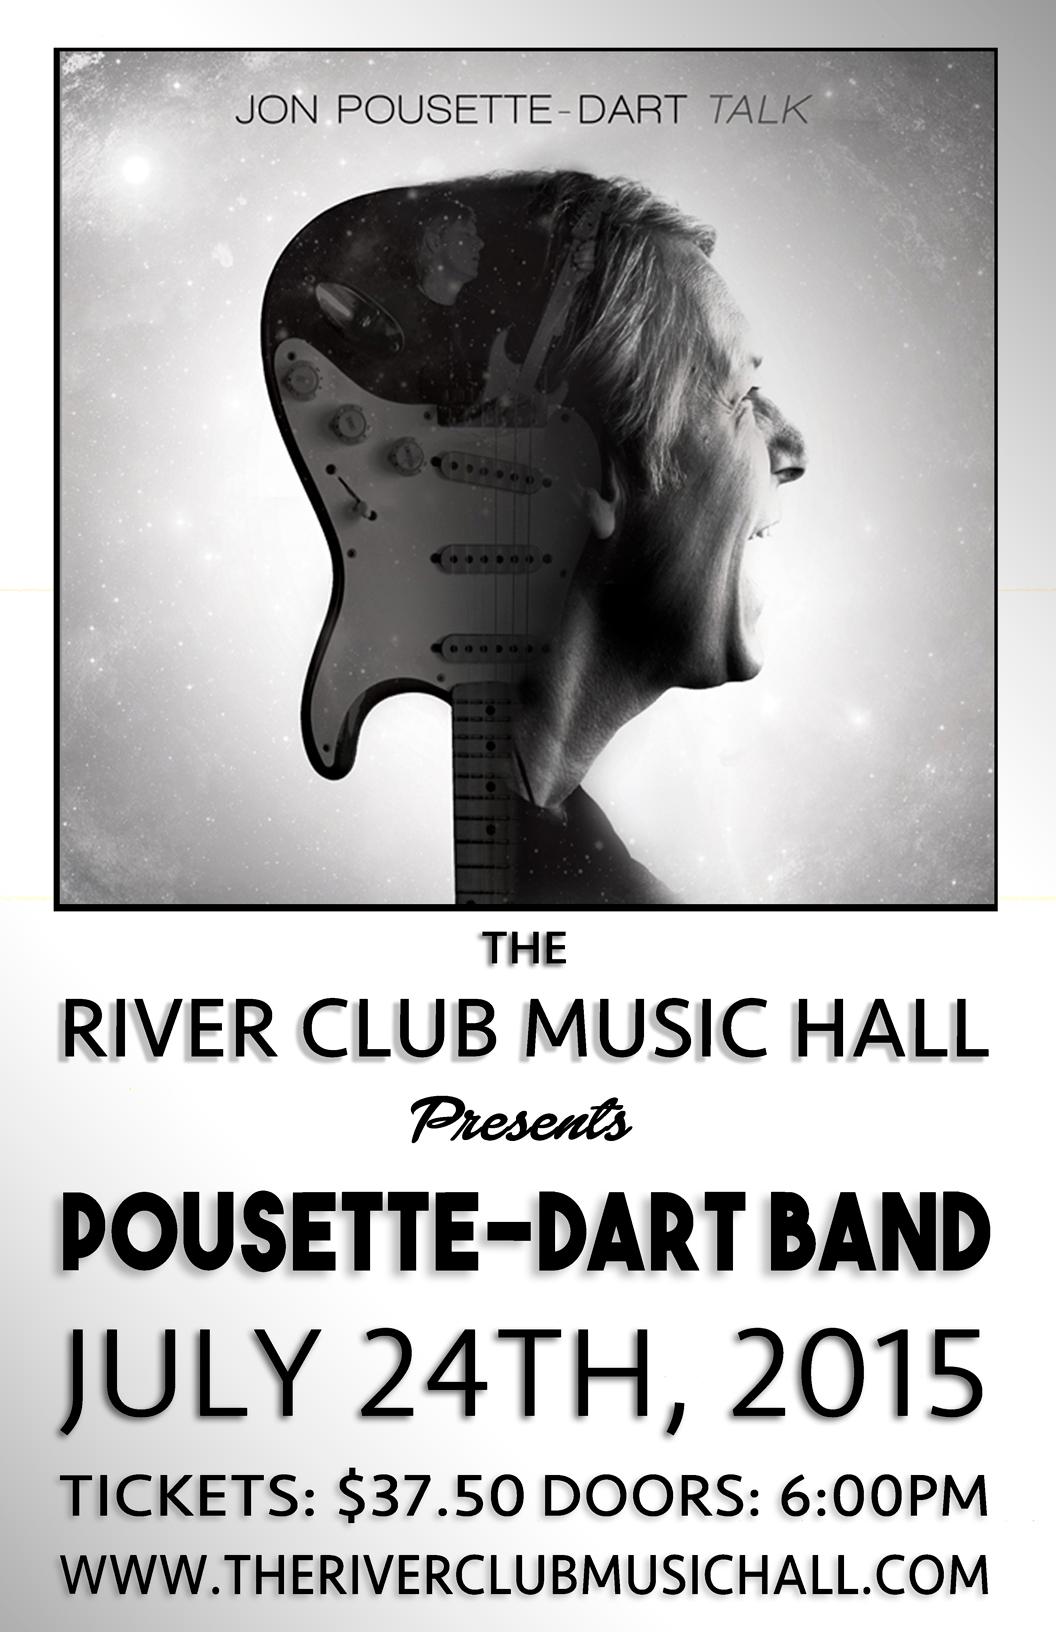 River club music hall jon pousette dart for Classic club music